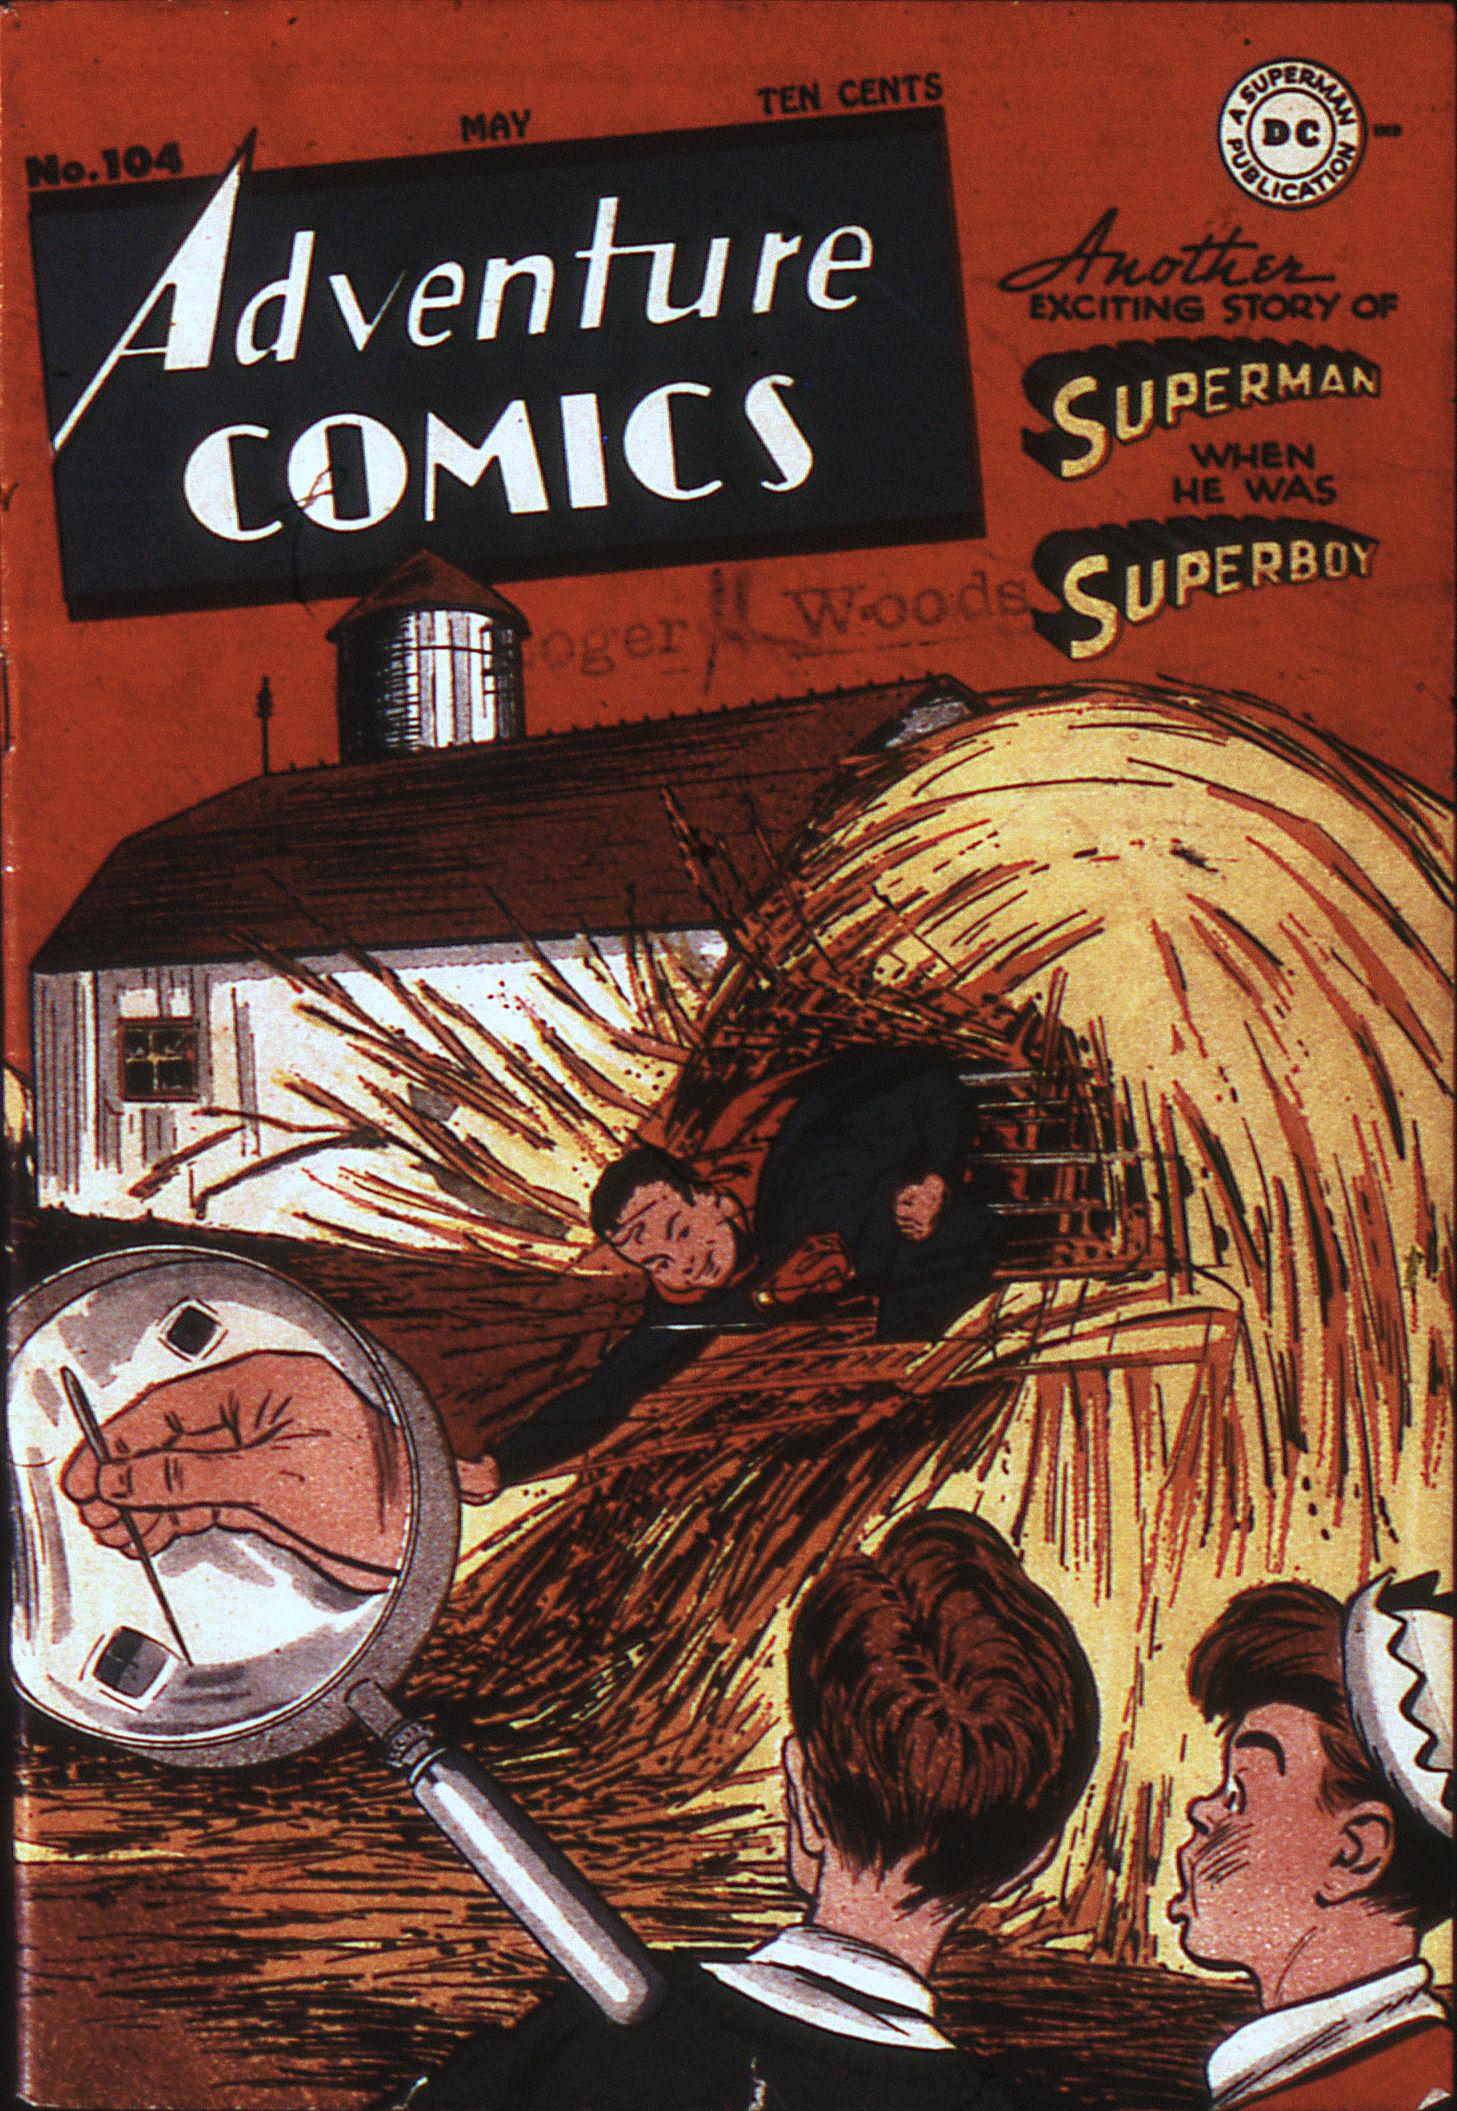 Read online Adventure Comics (1938) comic -  Issue #104 - 1